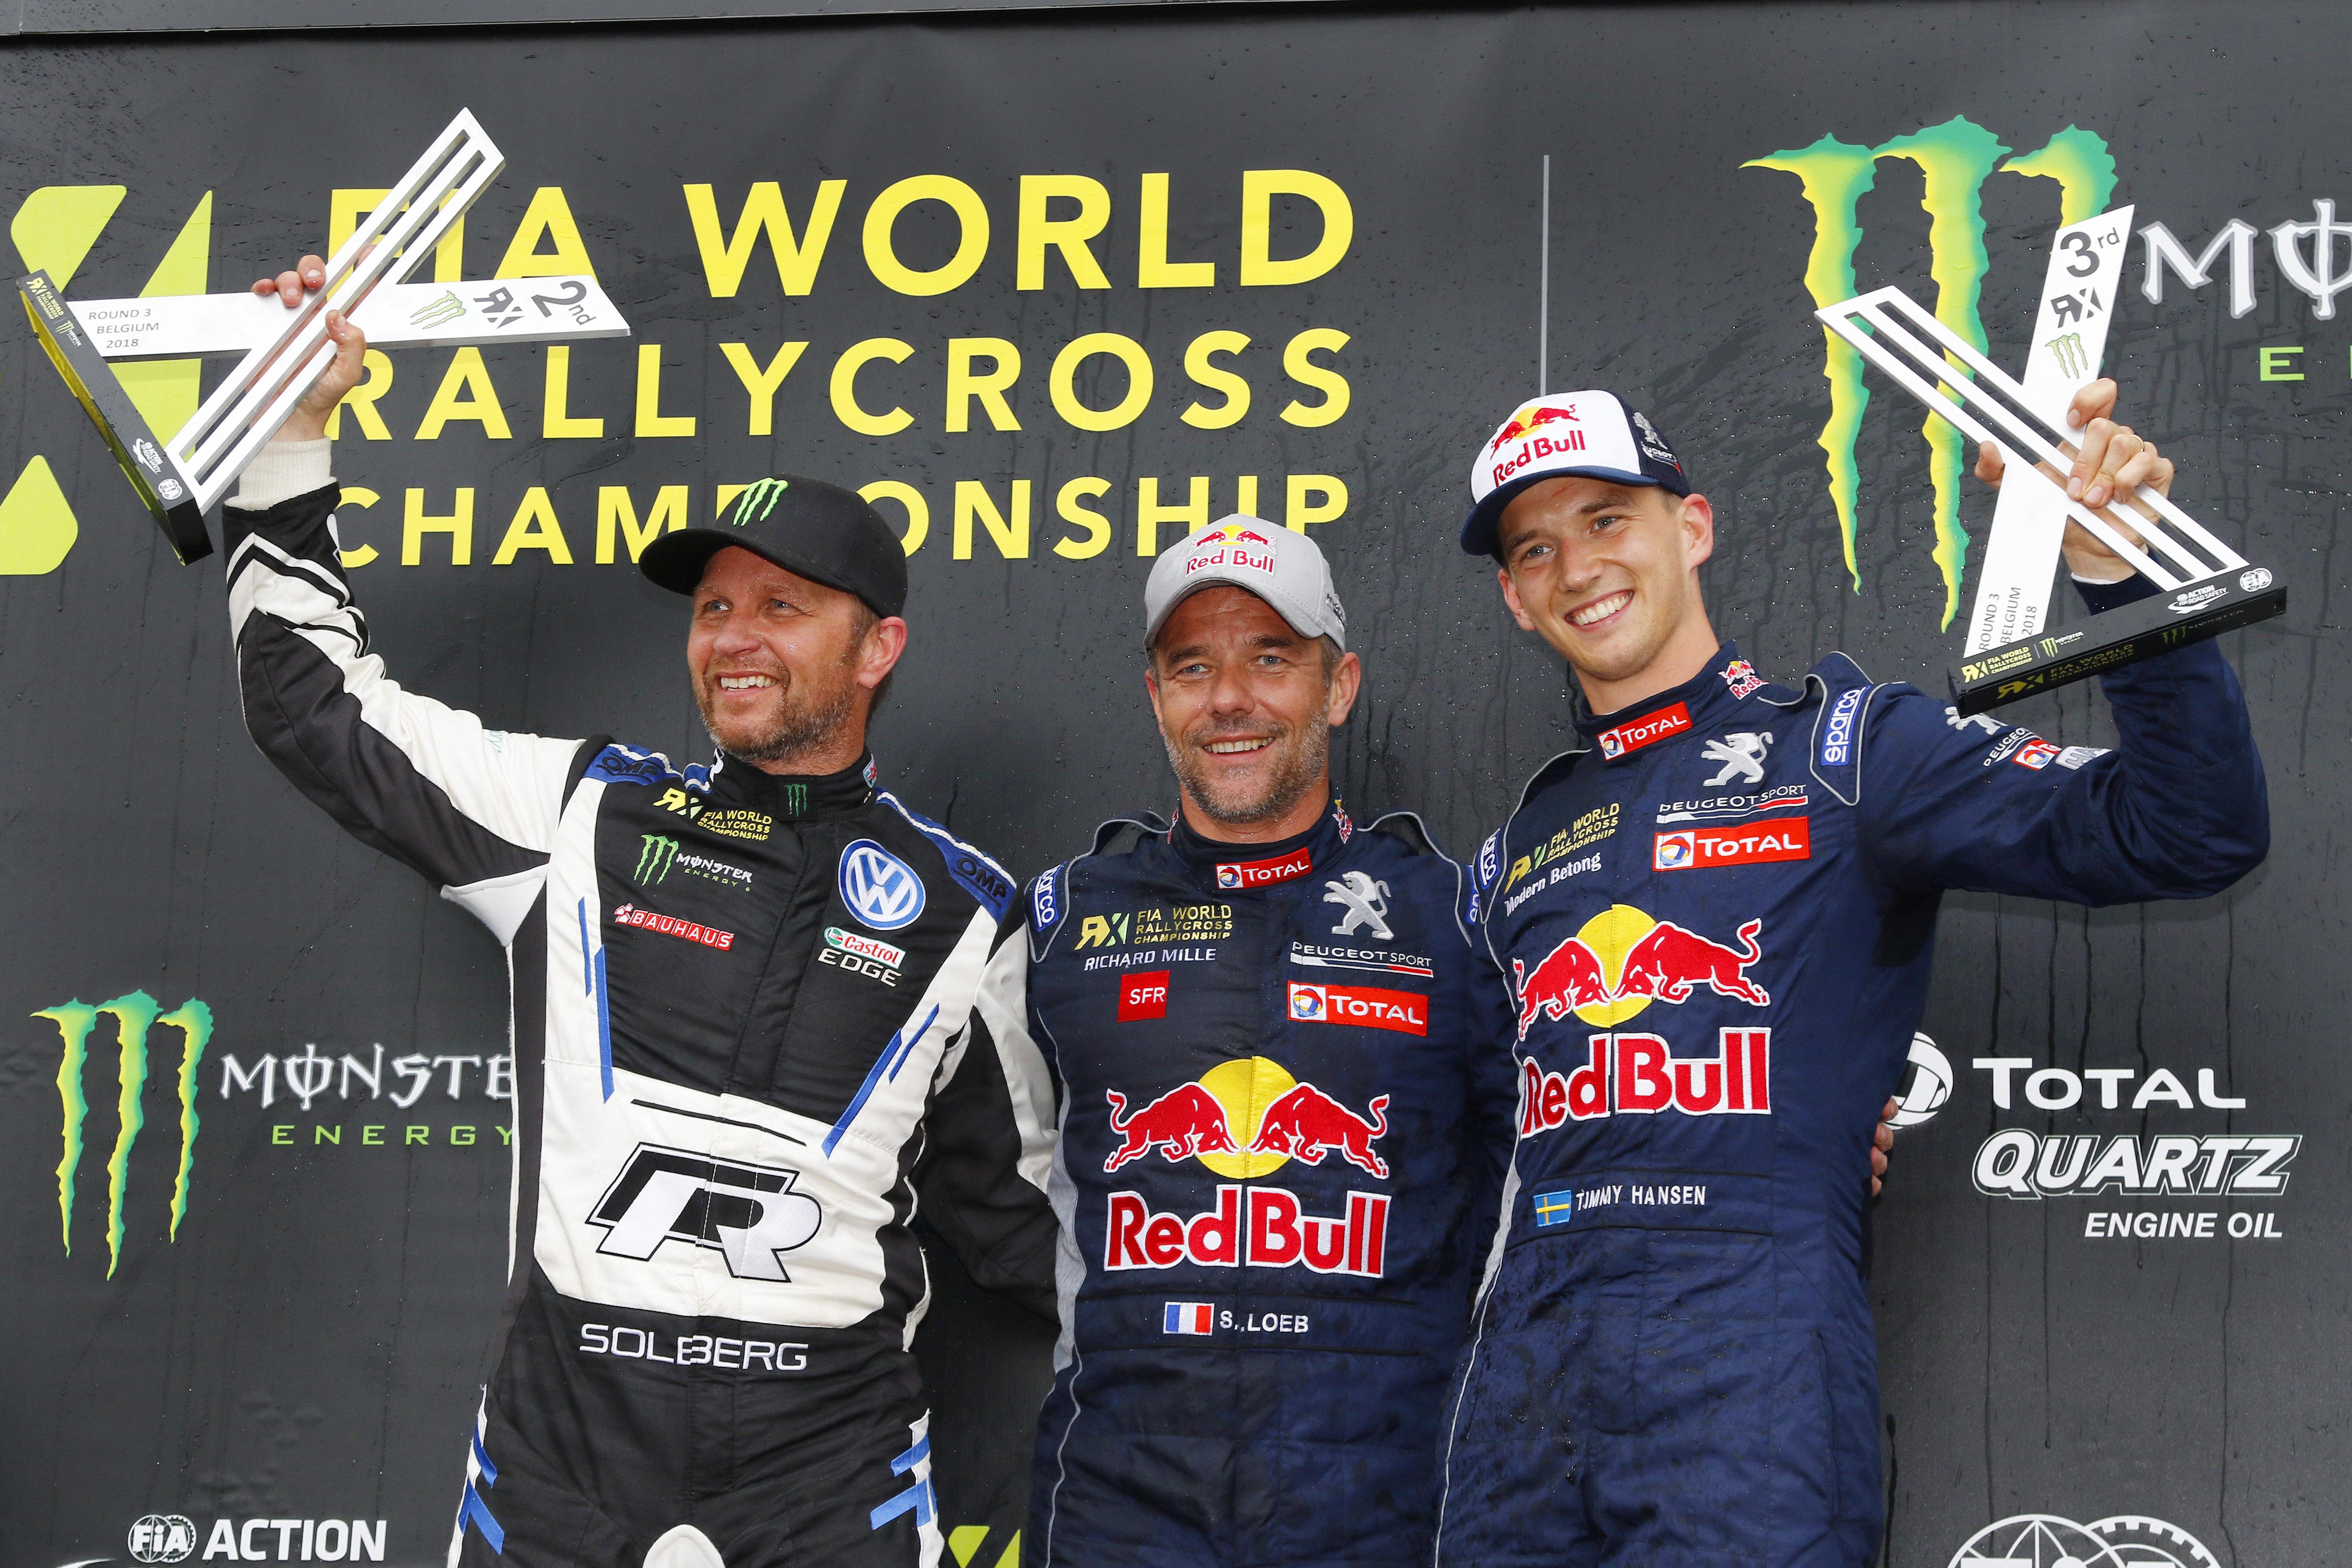 world rx of belgium - wrx race | news, photos, videos and social